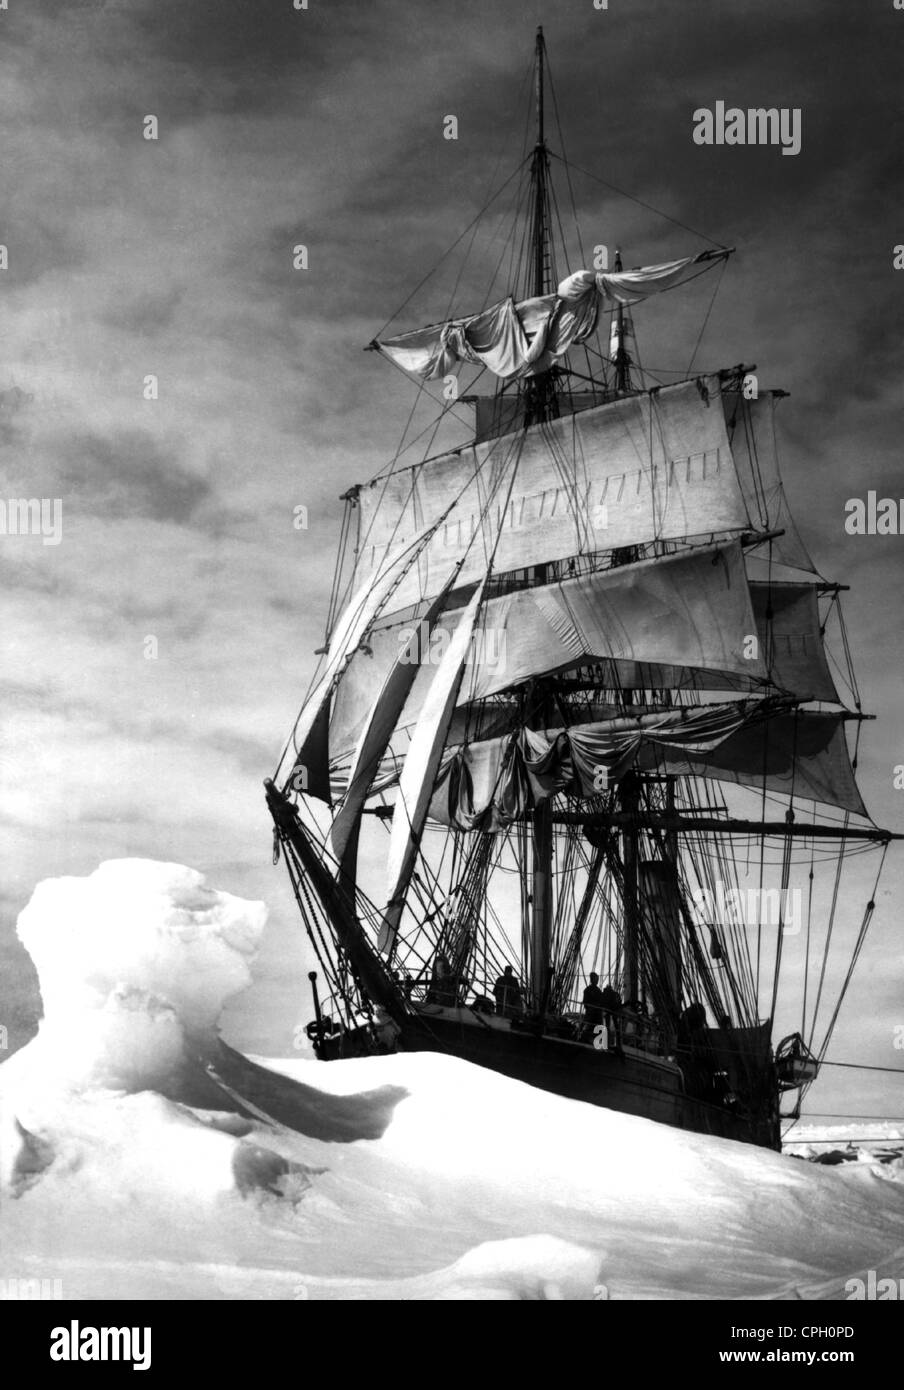 Scott, Robert Falcon, 6.6.1868 - 29.3.1912, British Antarctic explorer, expedición a la Antártida de 1910 Imagen De Stock